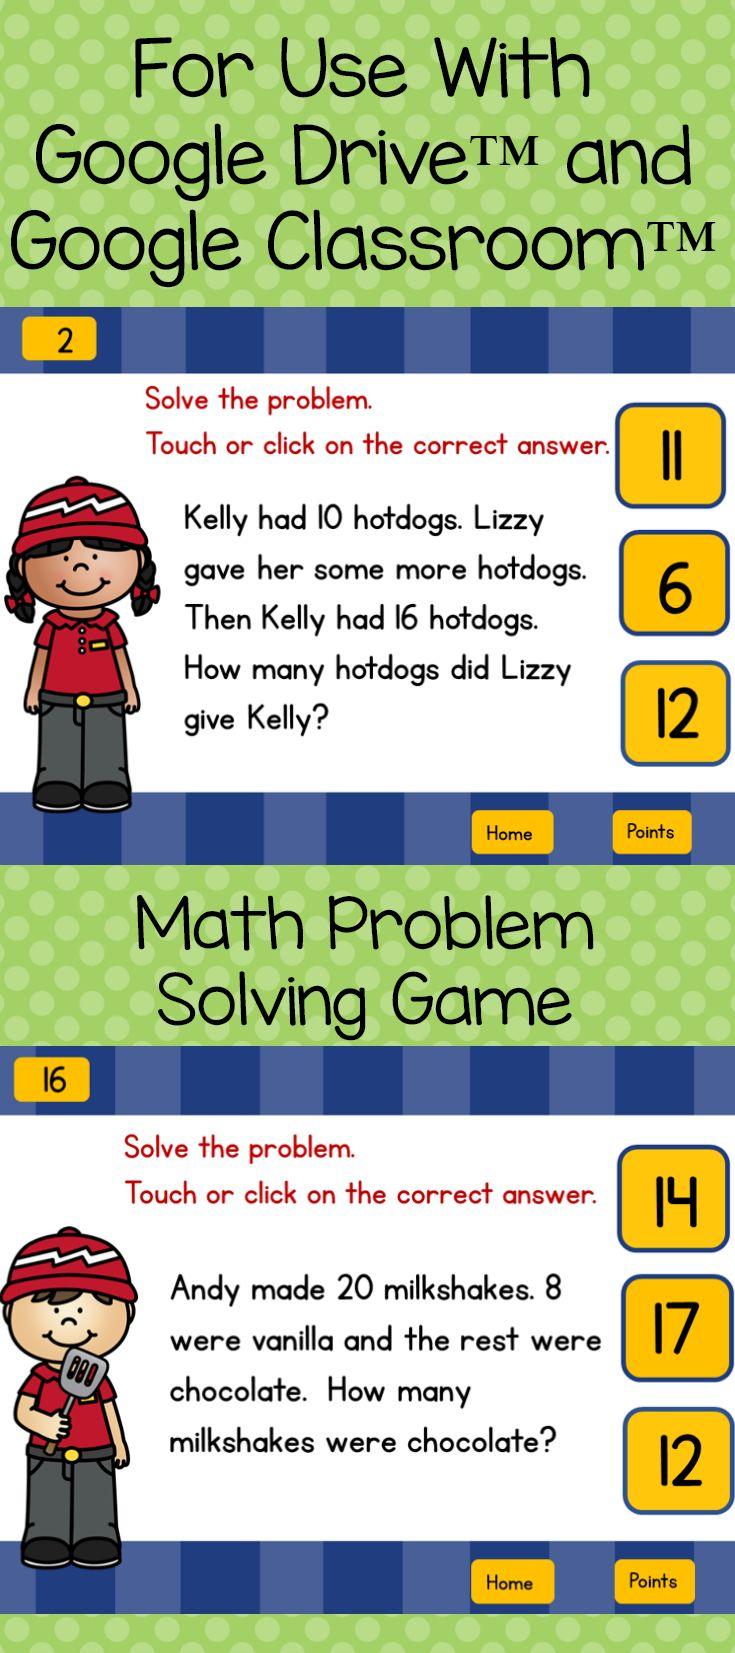 Math problem solving fast food fun for google classroom